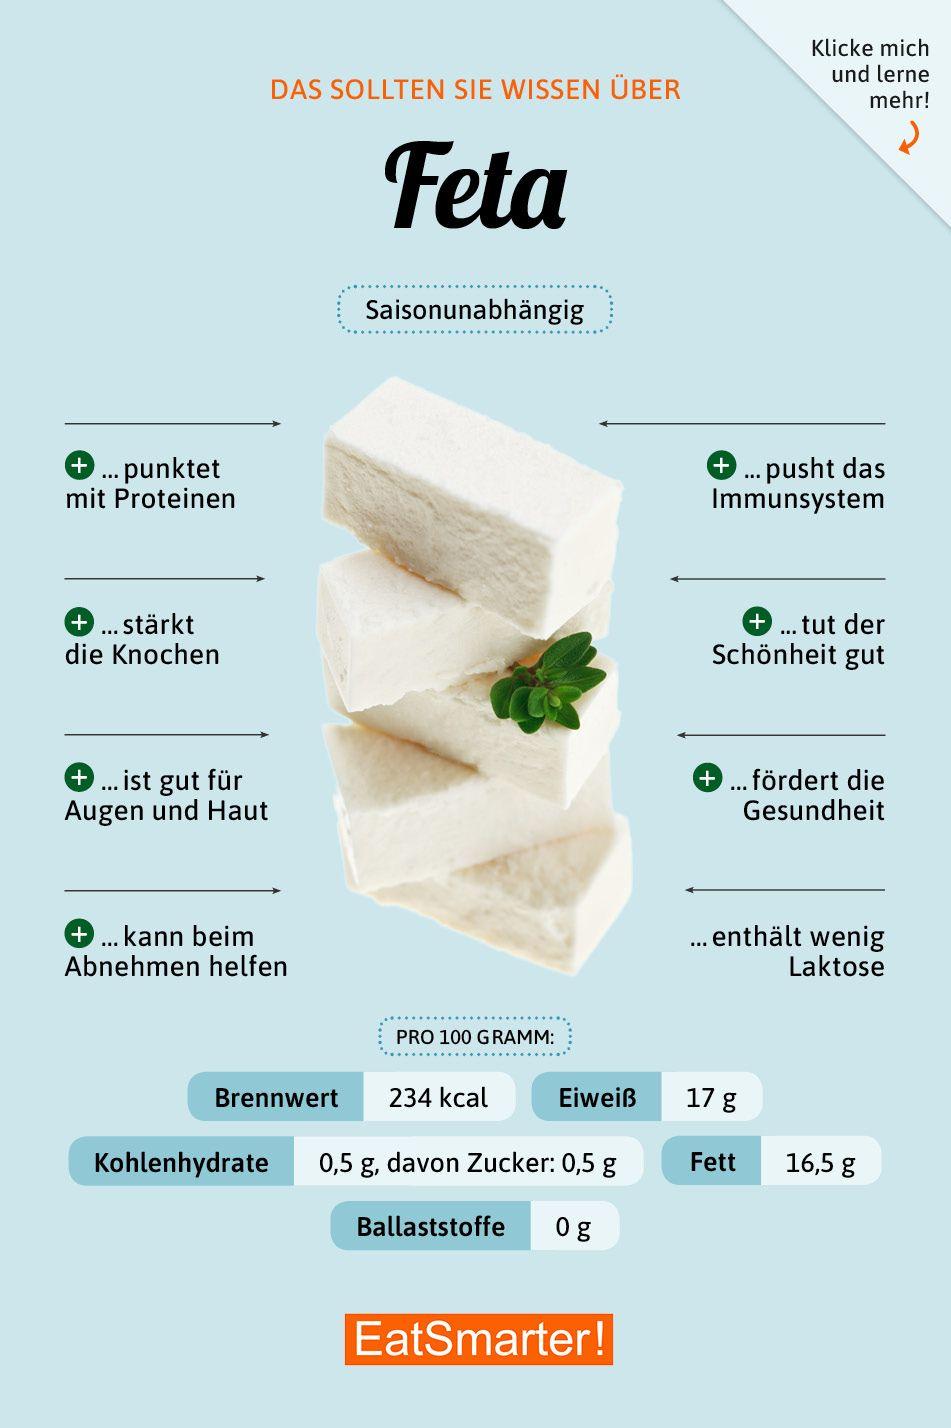 Das solltest du über Feta wissen | eatsmarter.de #ernährung #infografik #feta #workoutfood